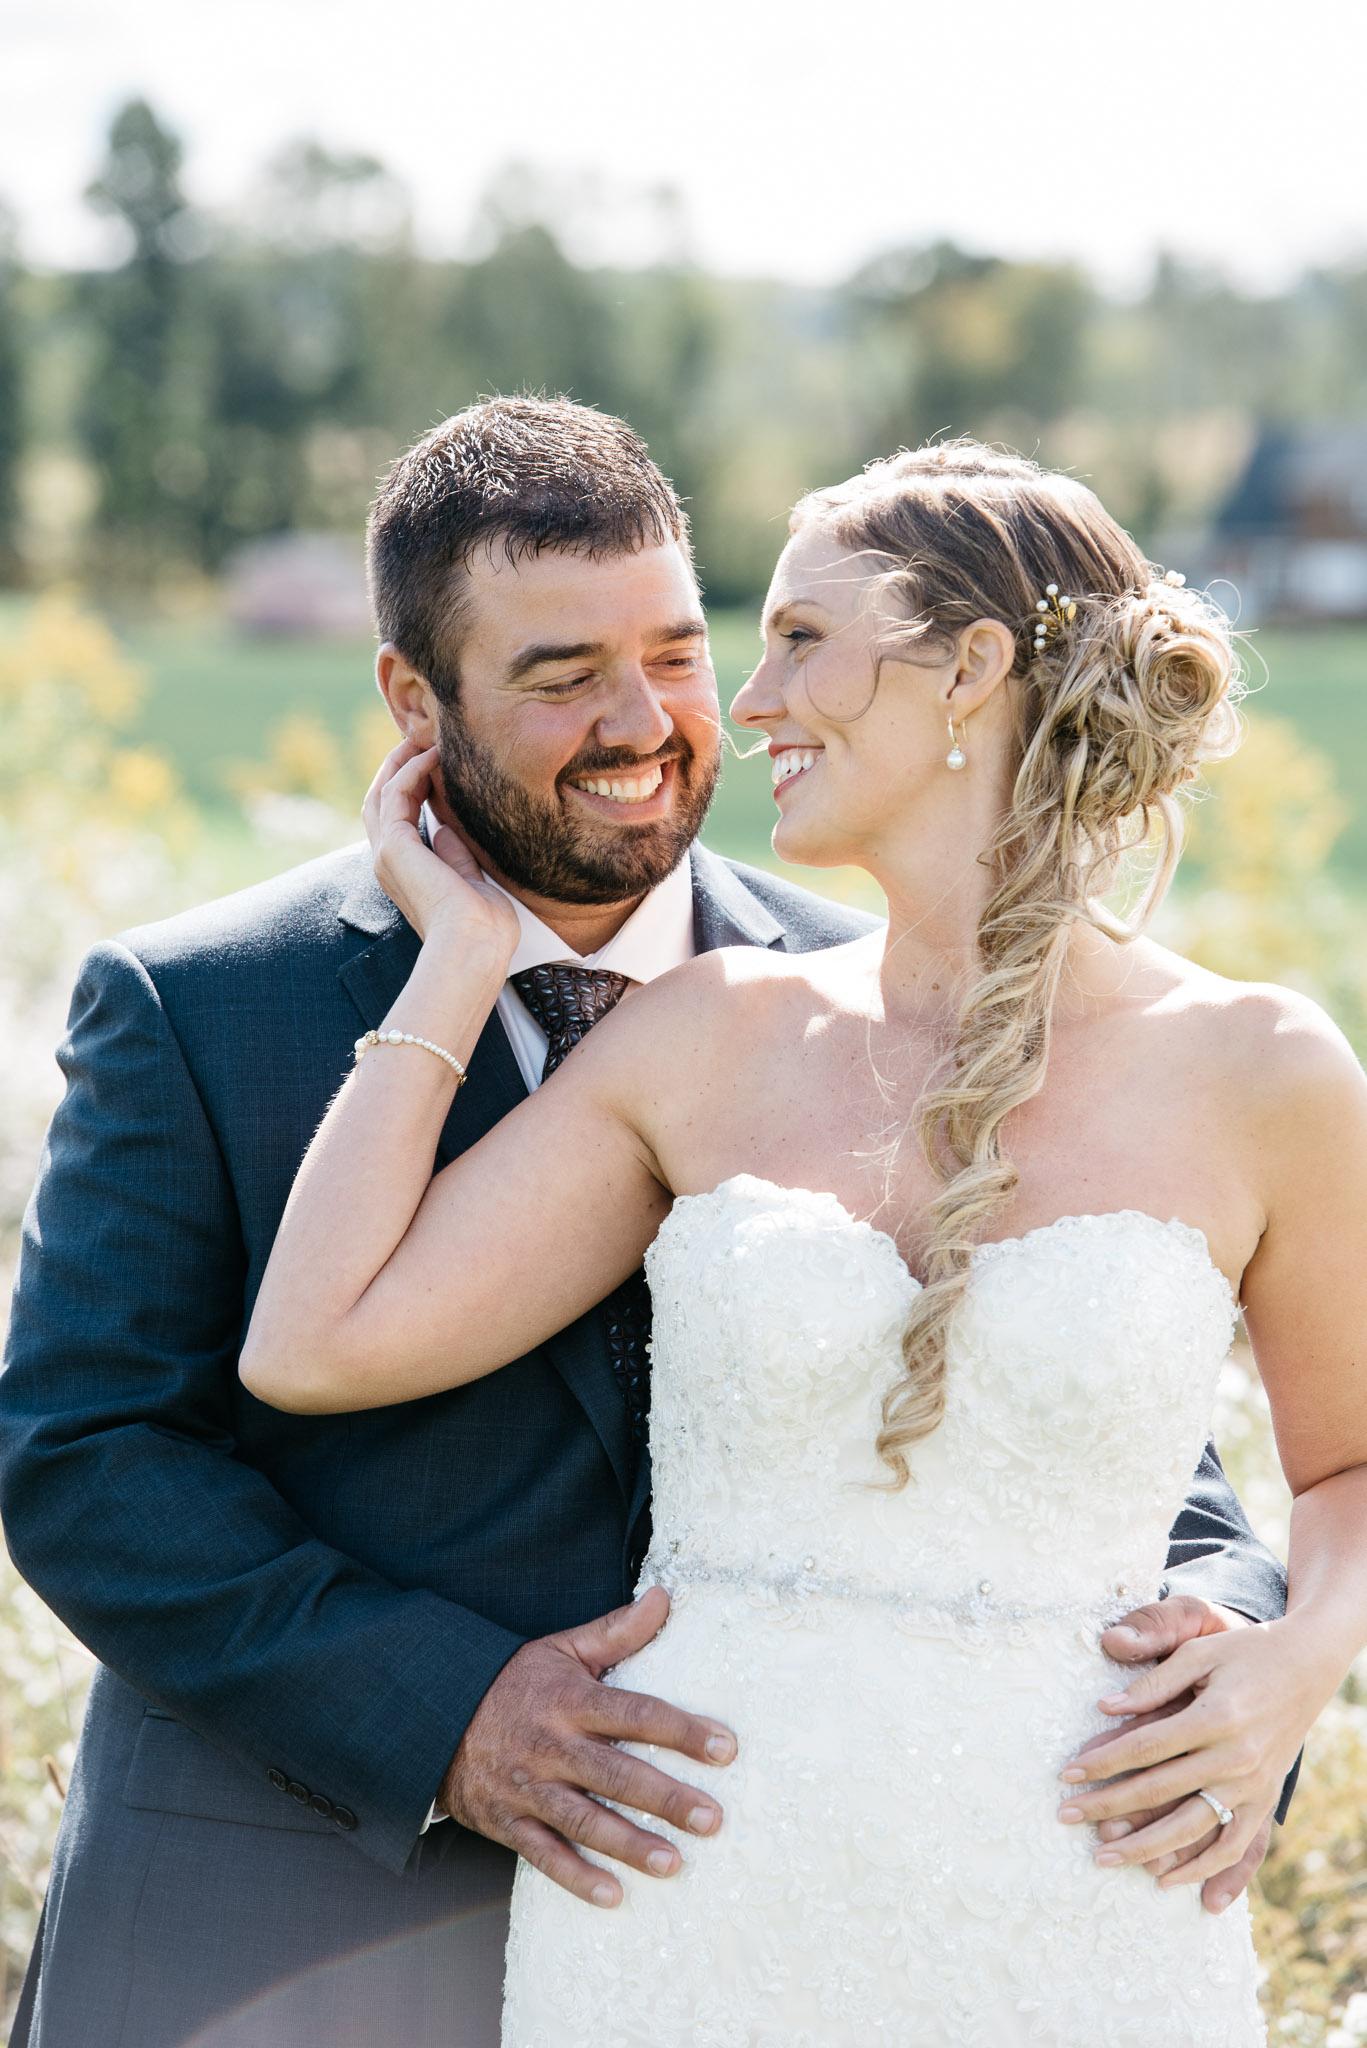 pittsburgh-ligonier-wedding-photographer-the-event-barn-at-highland-farms-11.jpg